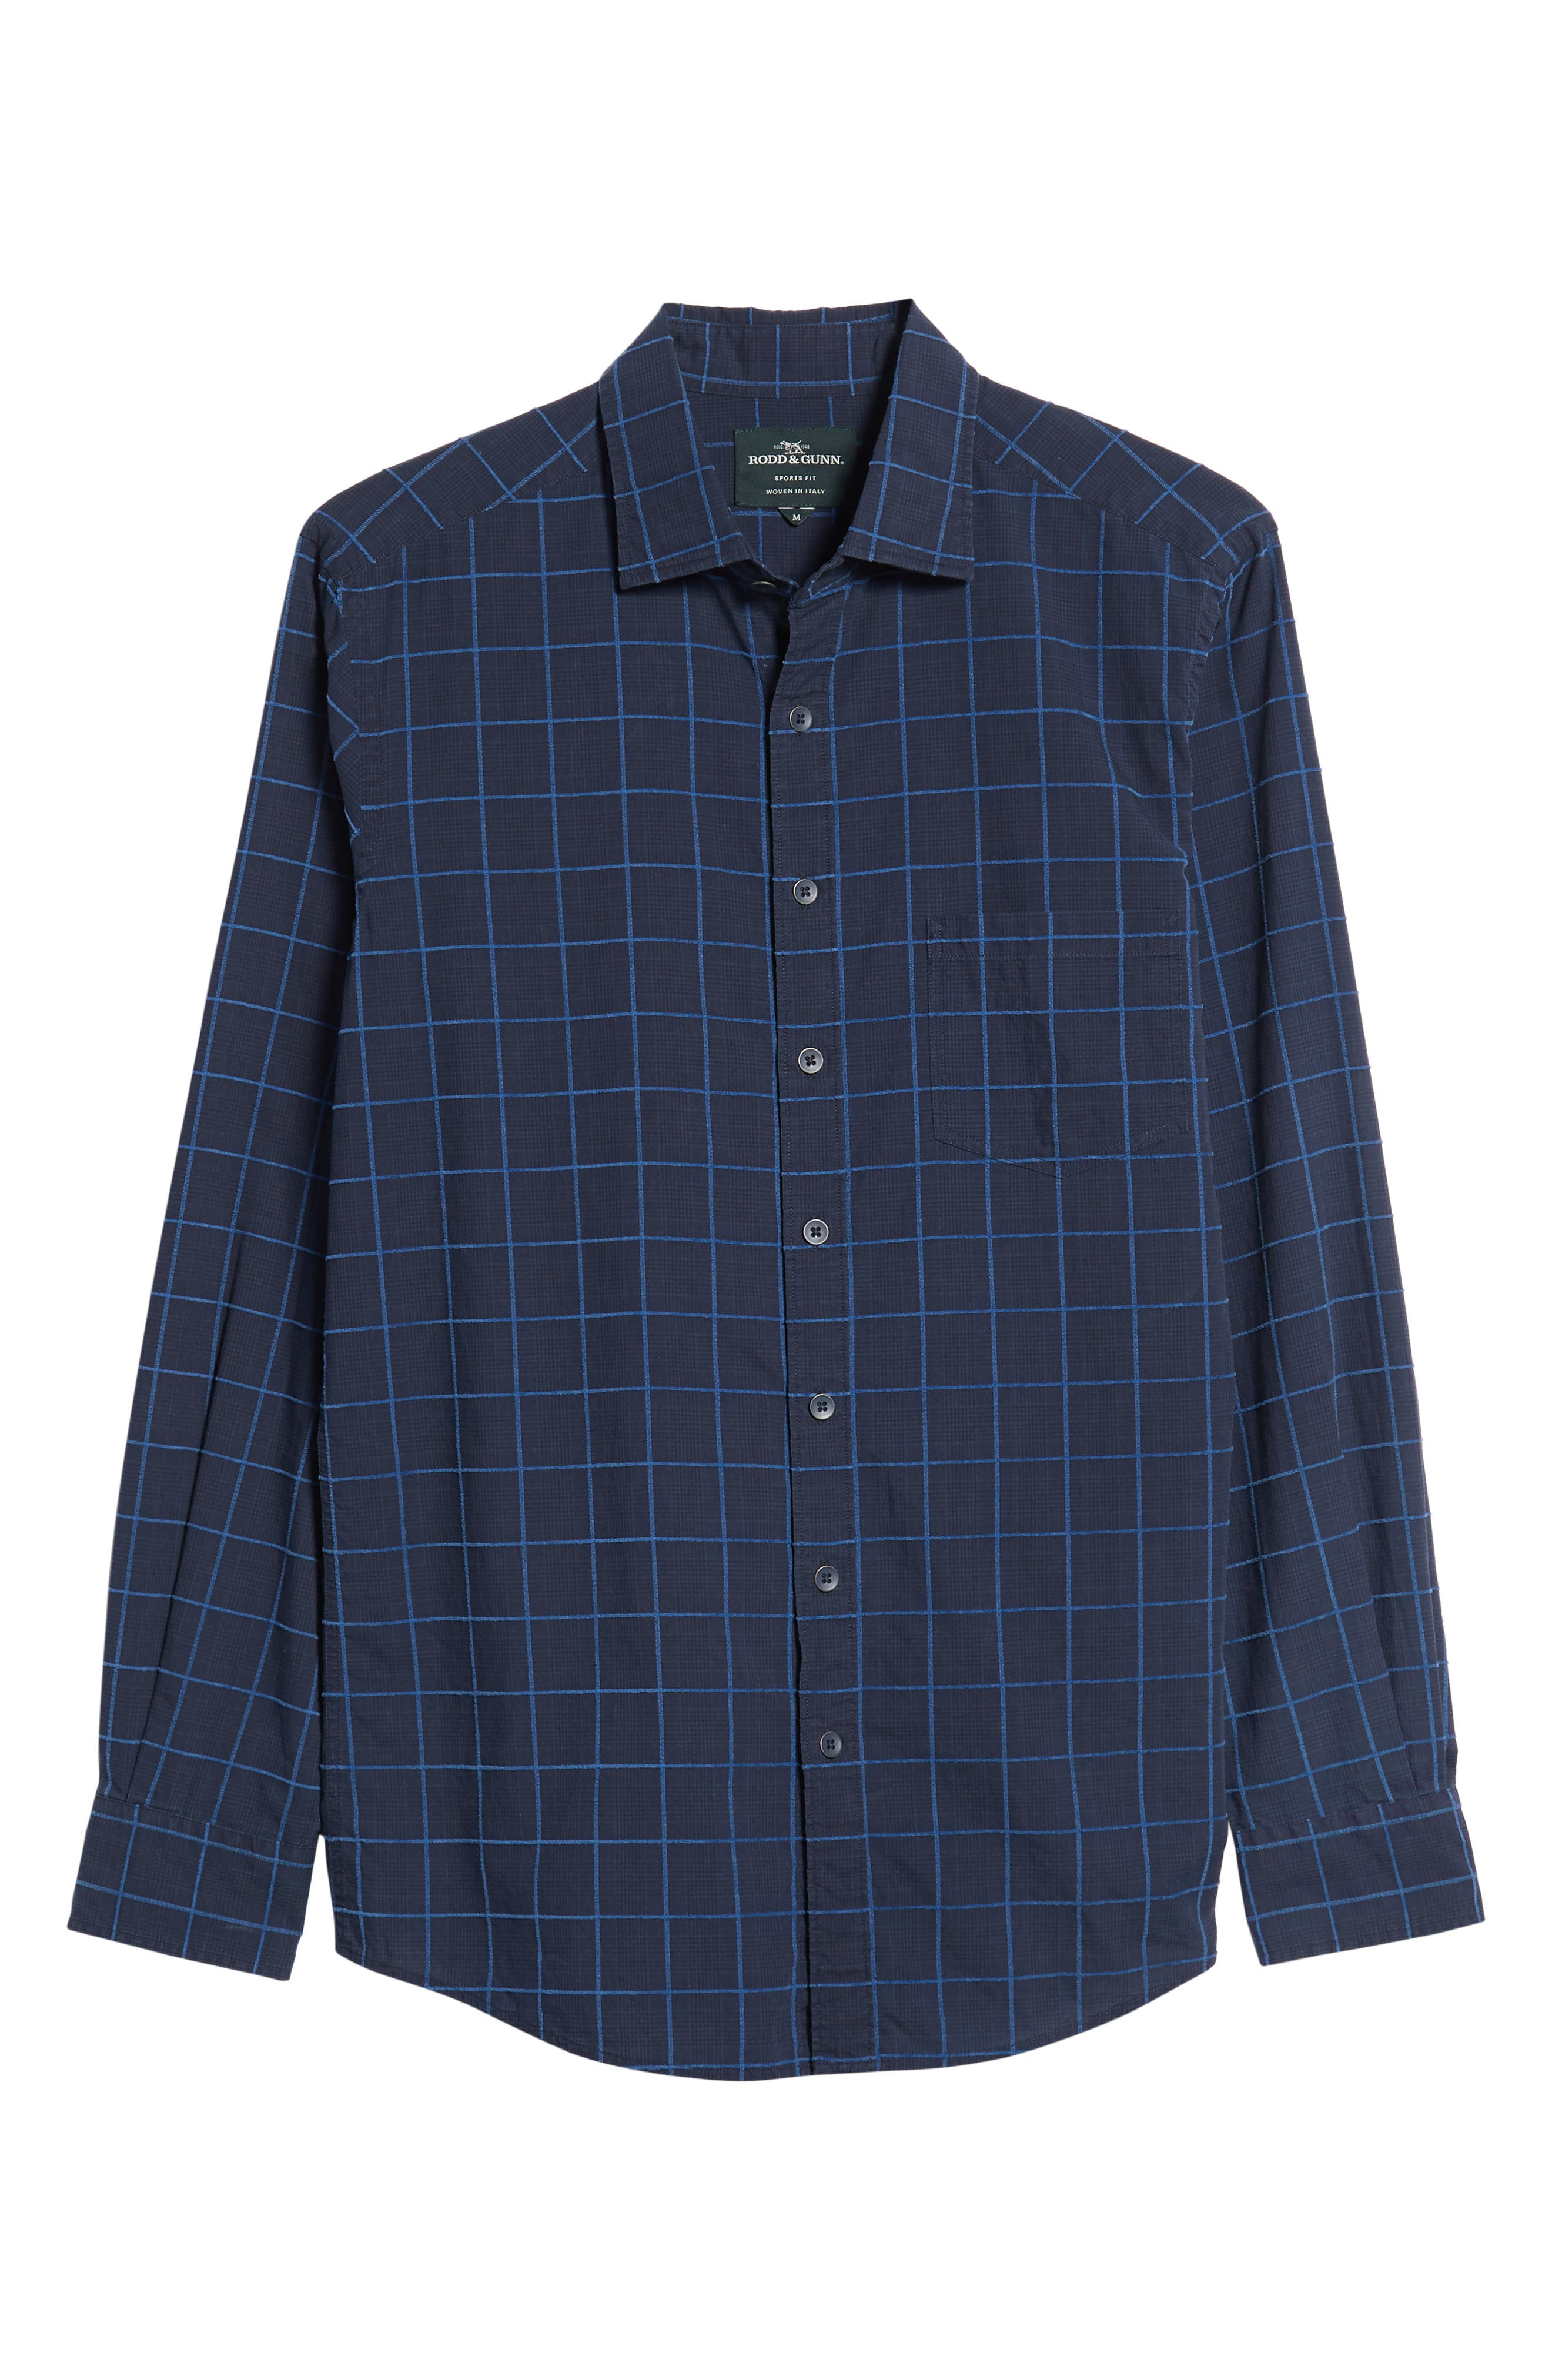 RODD & GUNN, Hindley Creek Regular Fit Sport Shirt, Alternate thumbnail 5, color, NAVY